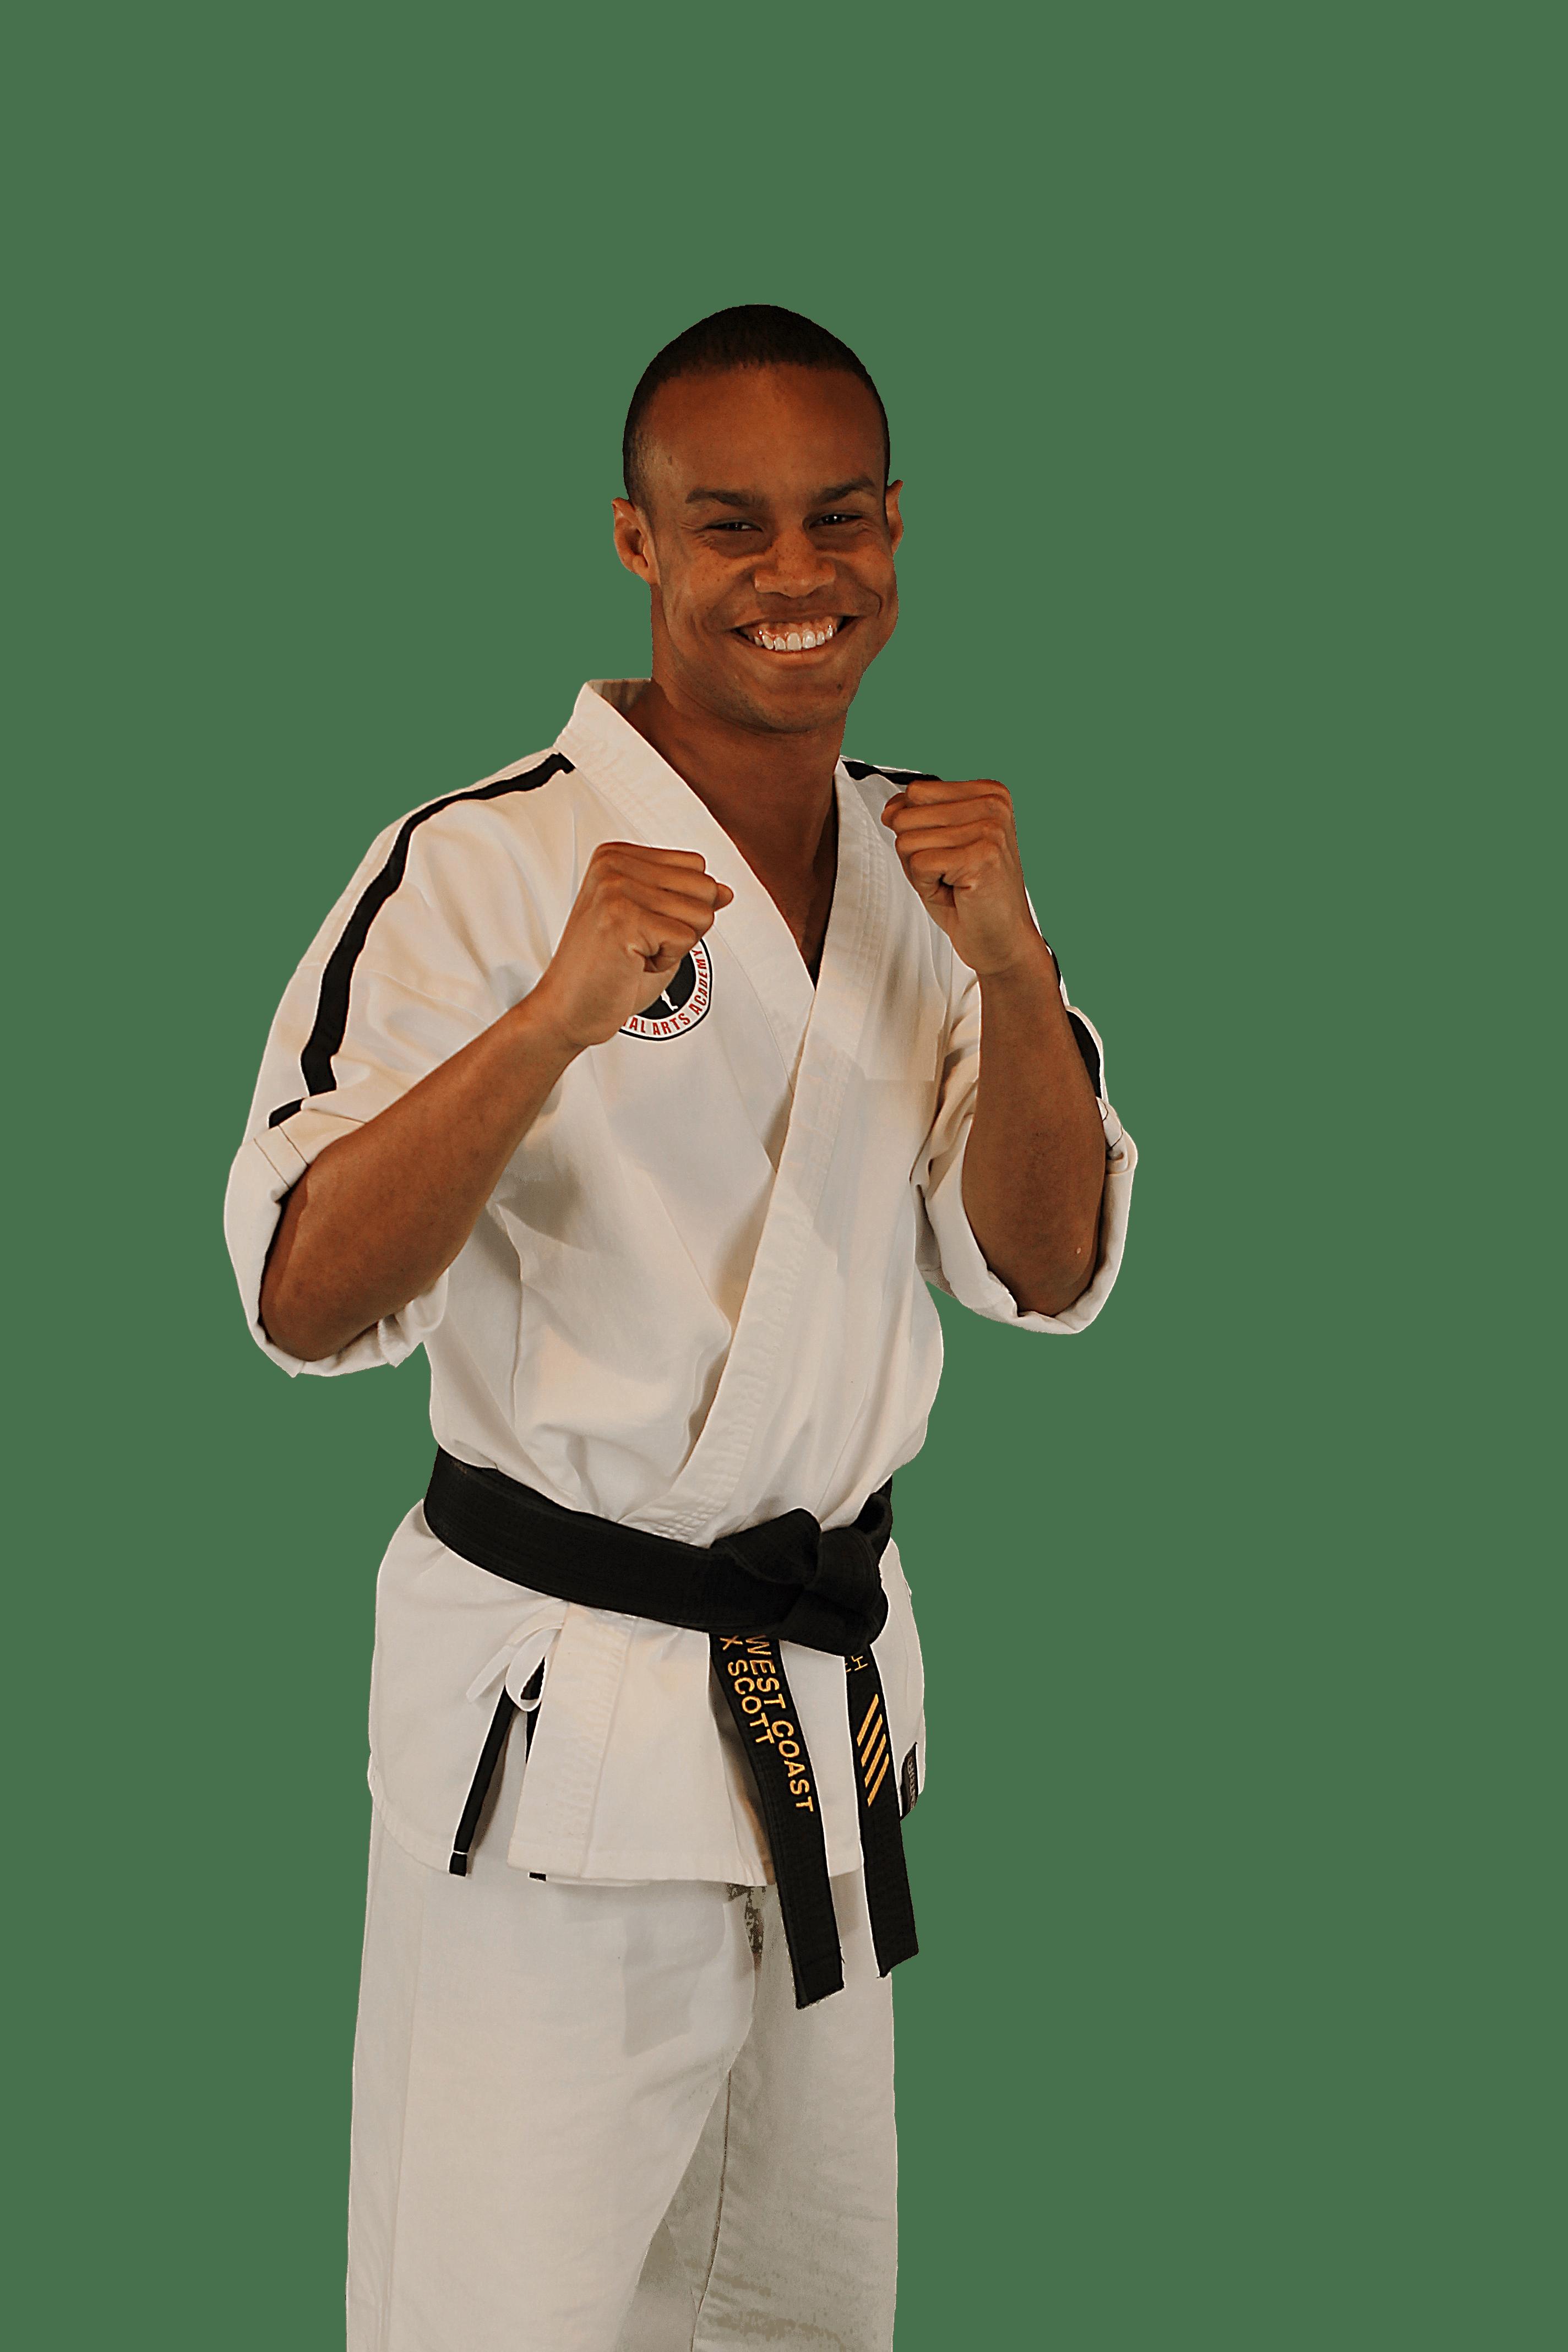 Alex Scott in Jonesboro - Joey Perry Martial Arts Academy